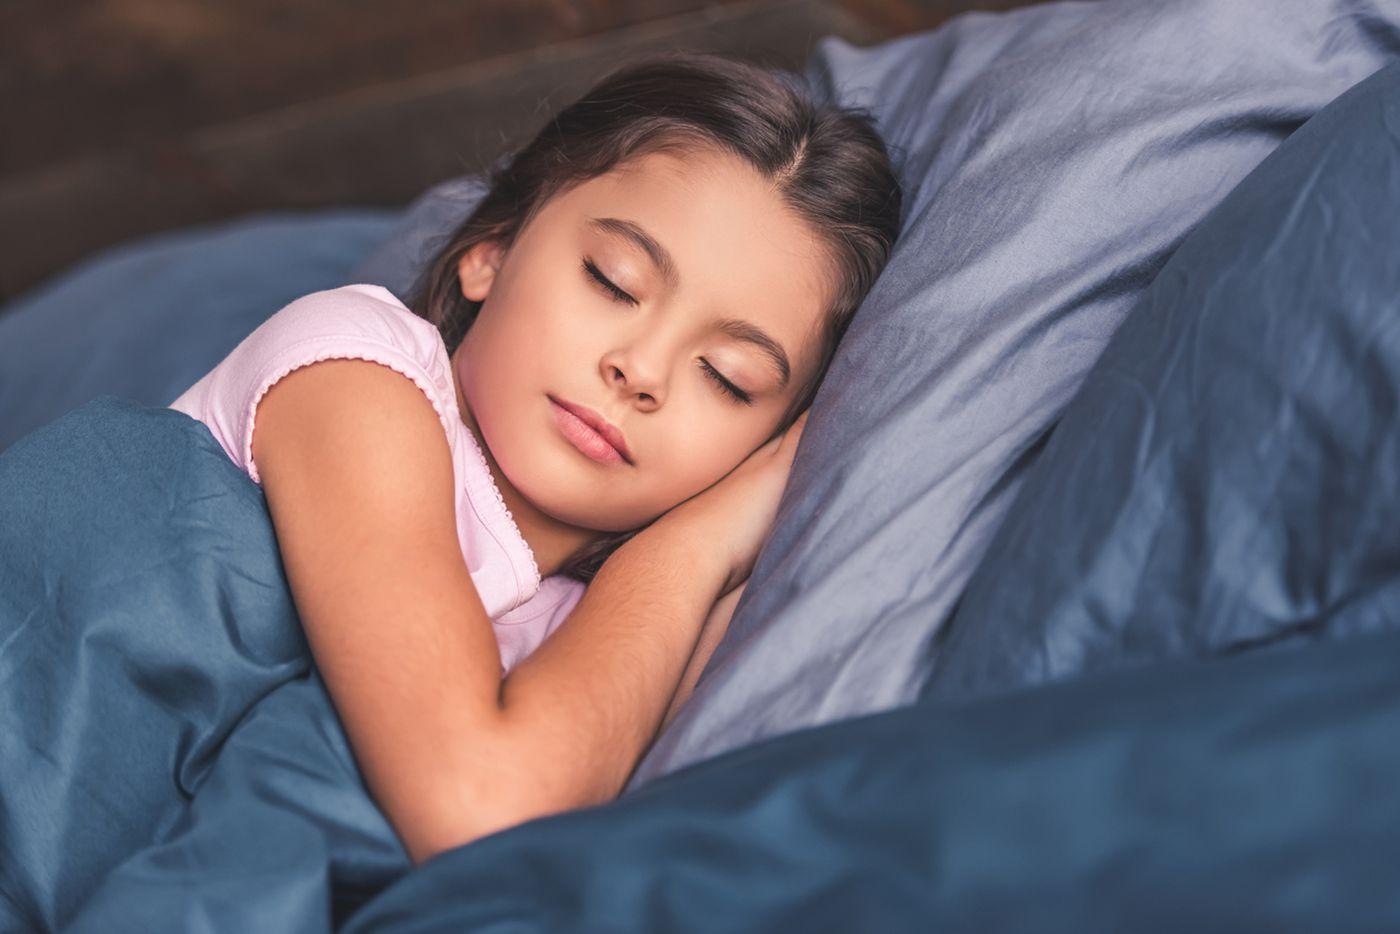 How to create healthy sleep habits in children